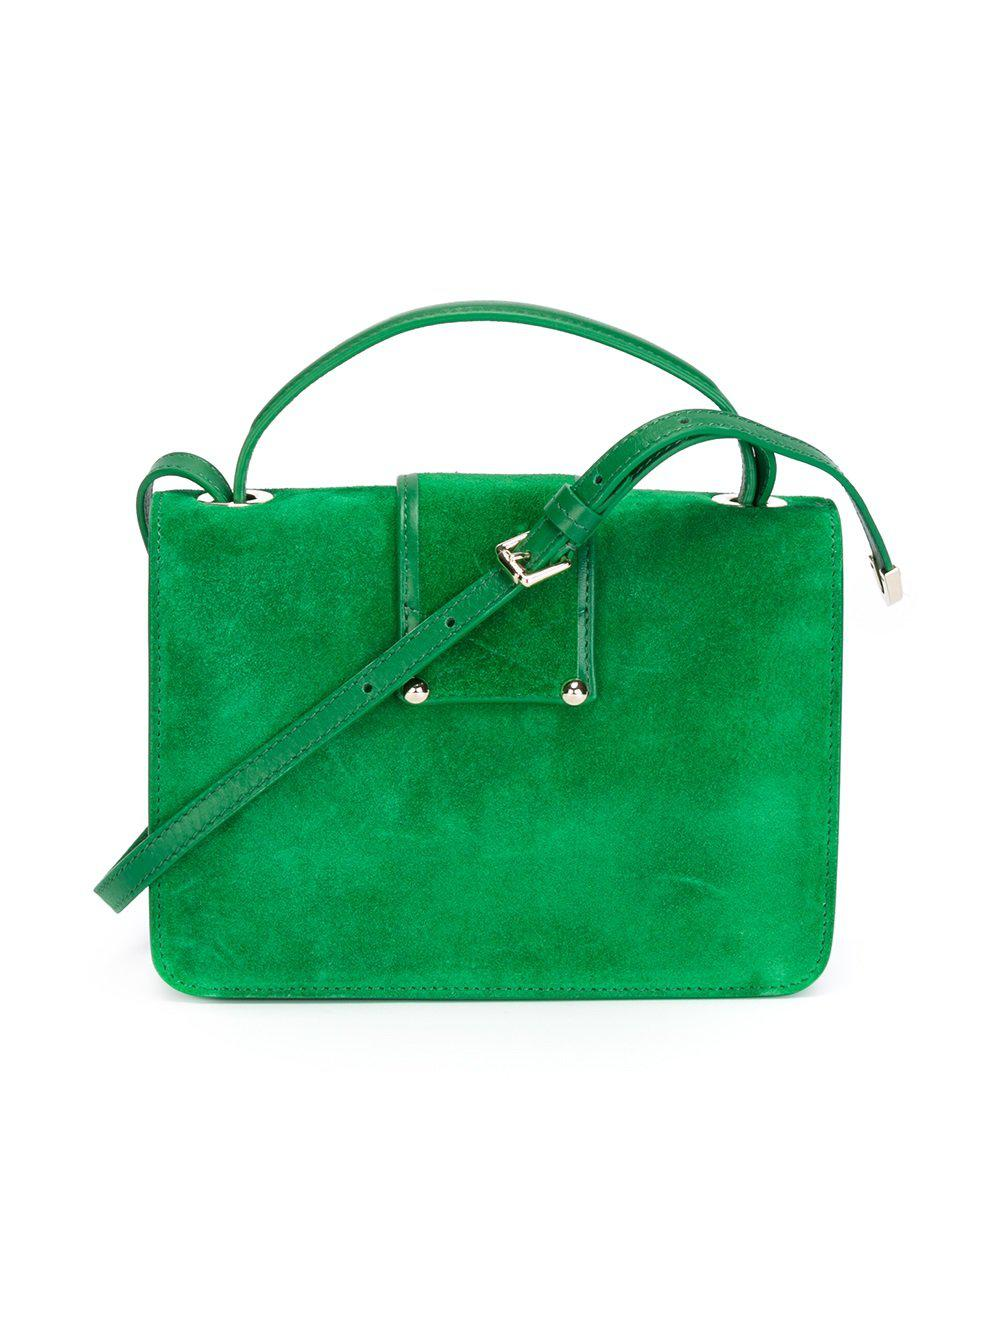 Jimmy Choo 'rebel' Crossbodybag in Green